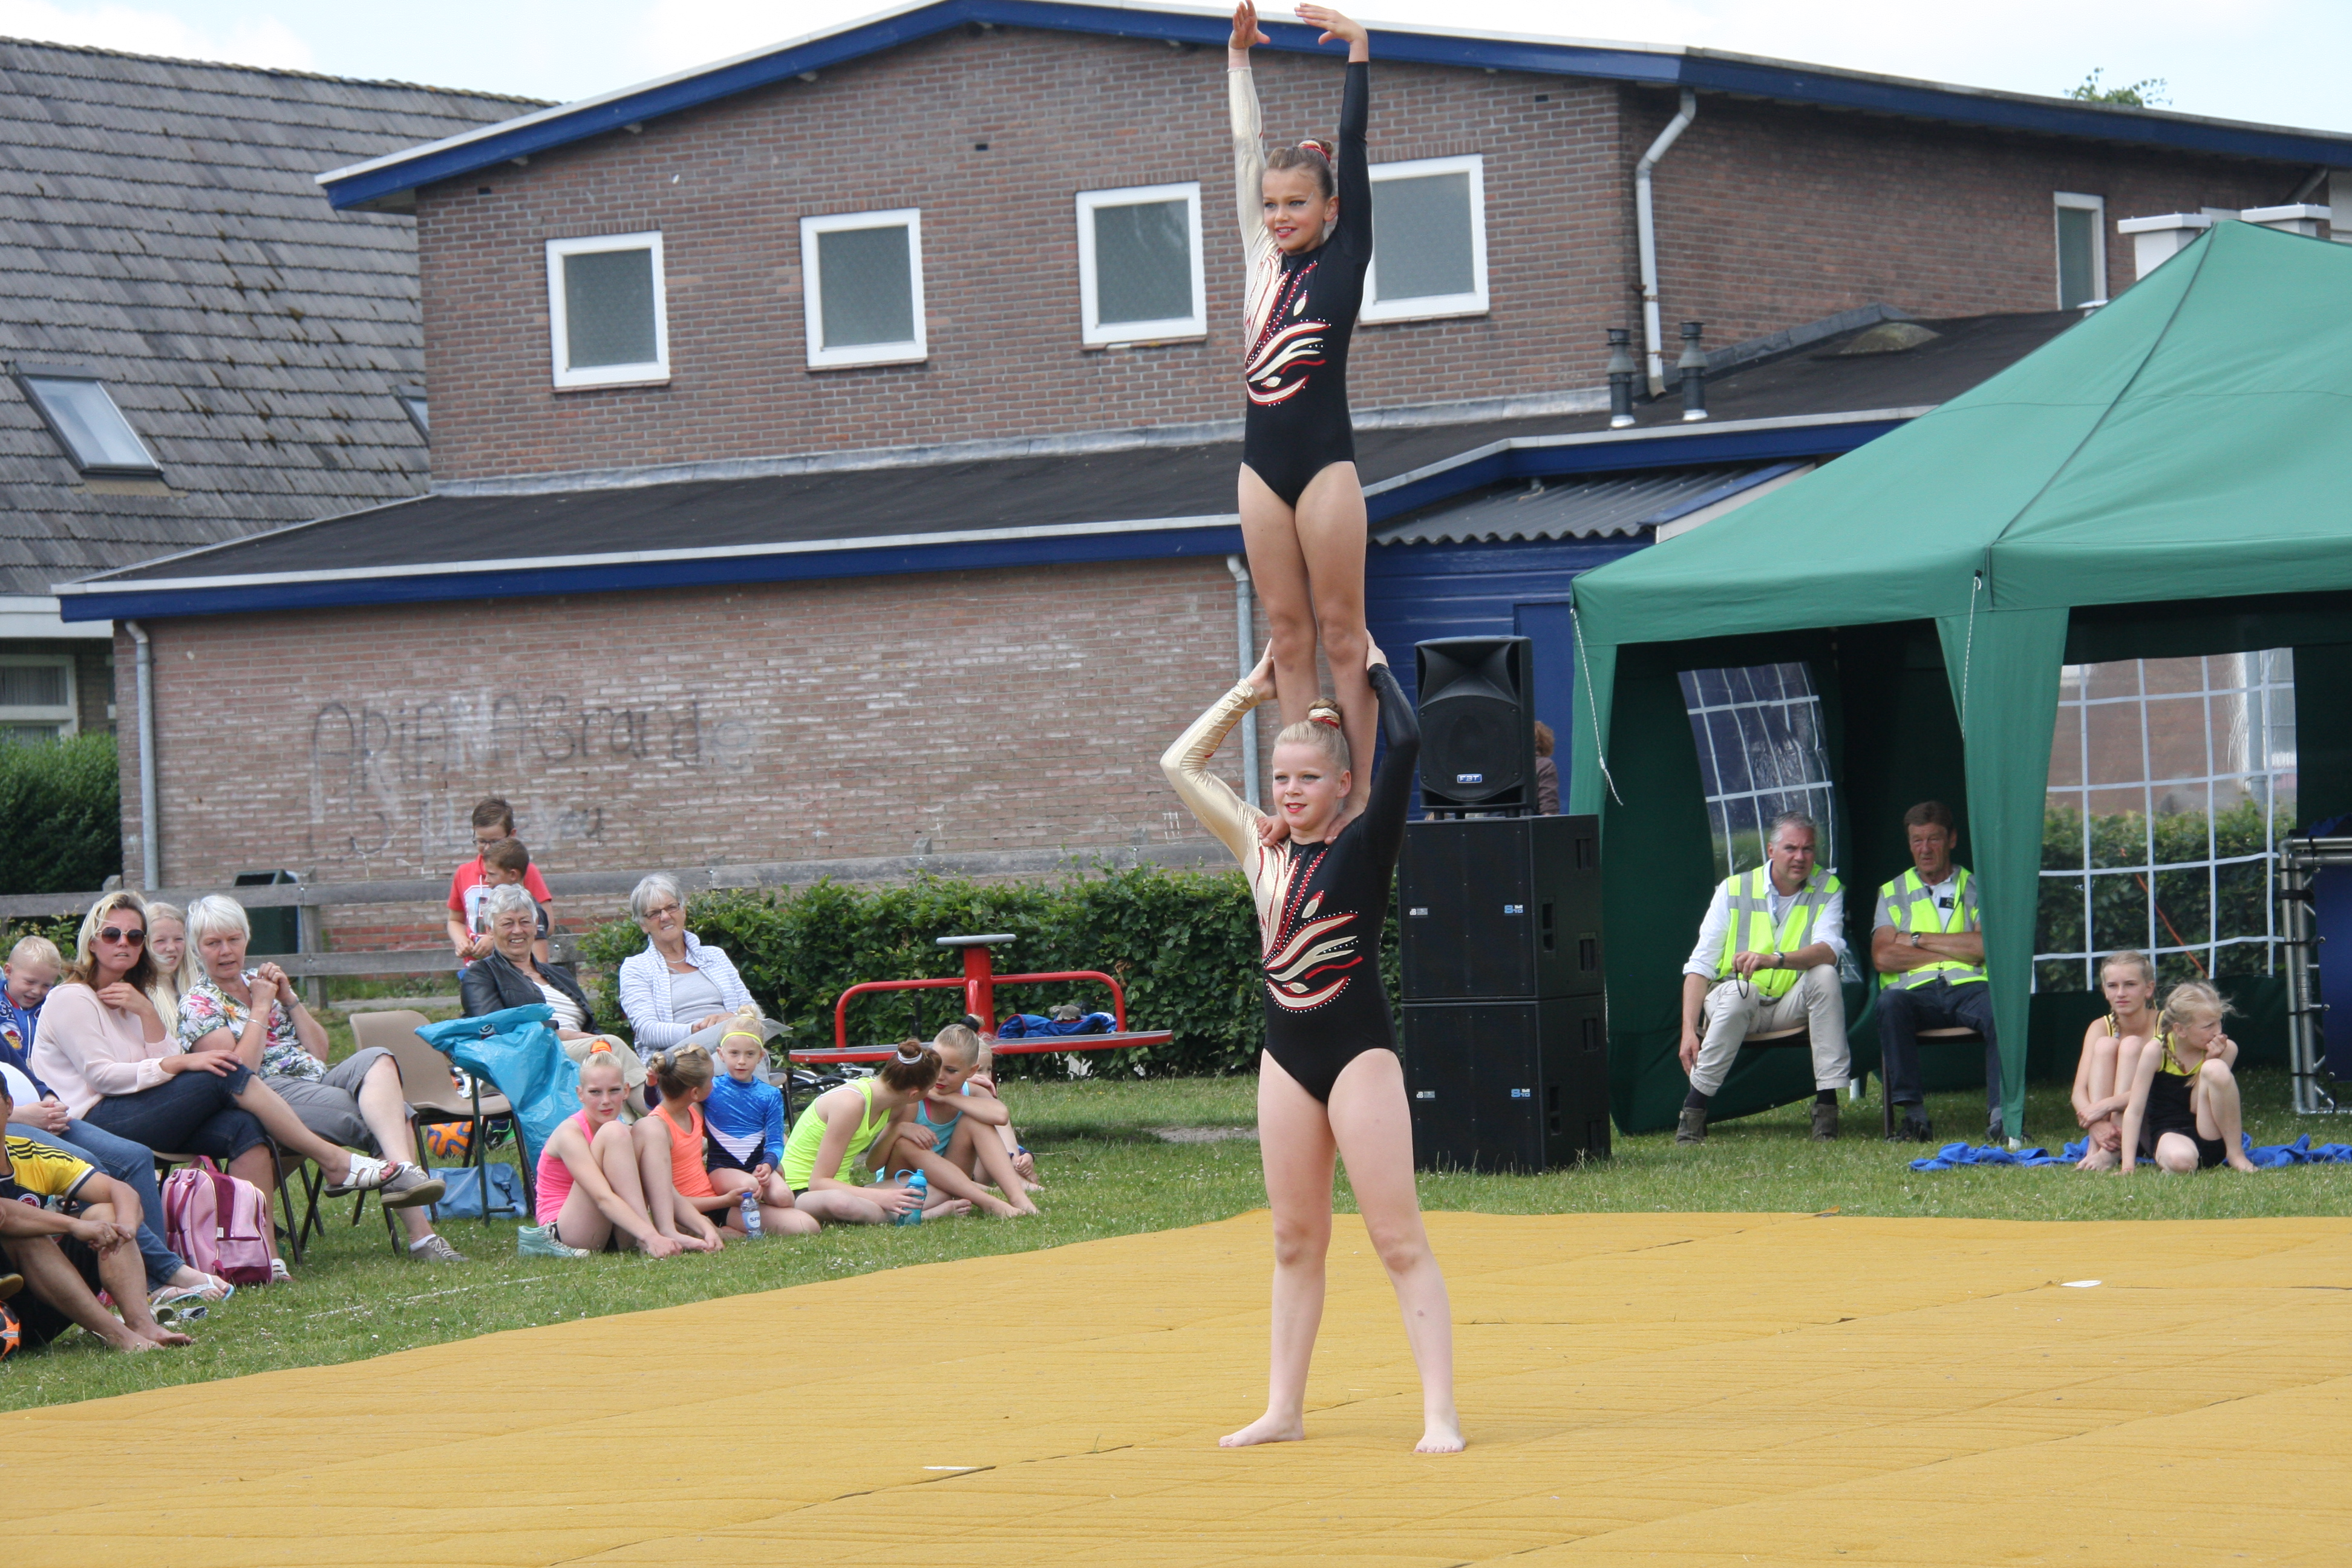 gymnastiekuitvoering-juni-2015-003